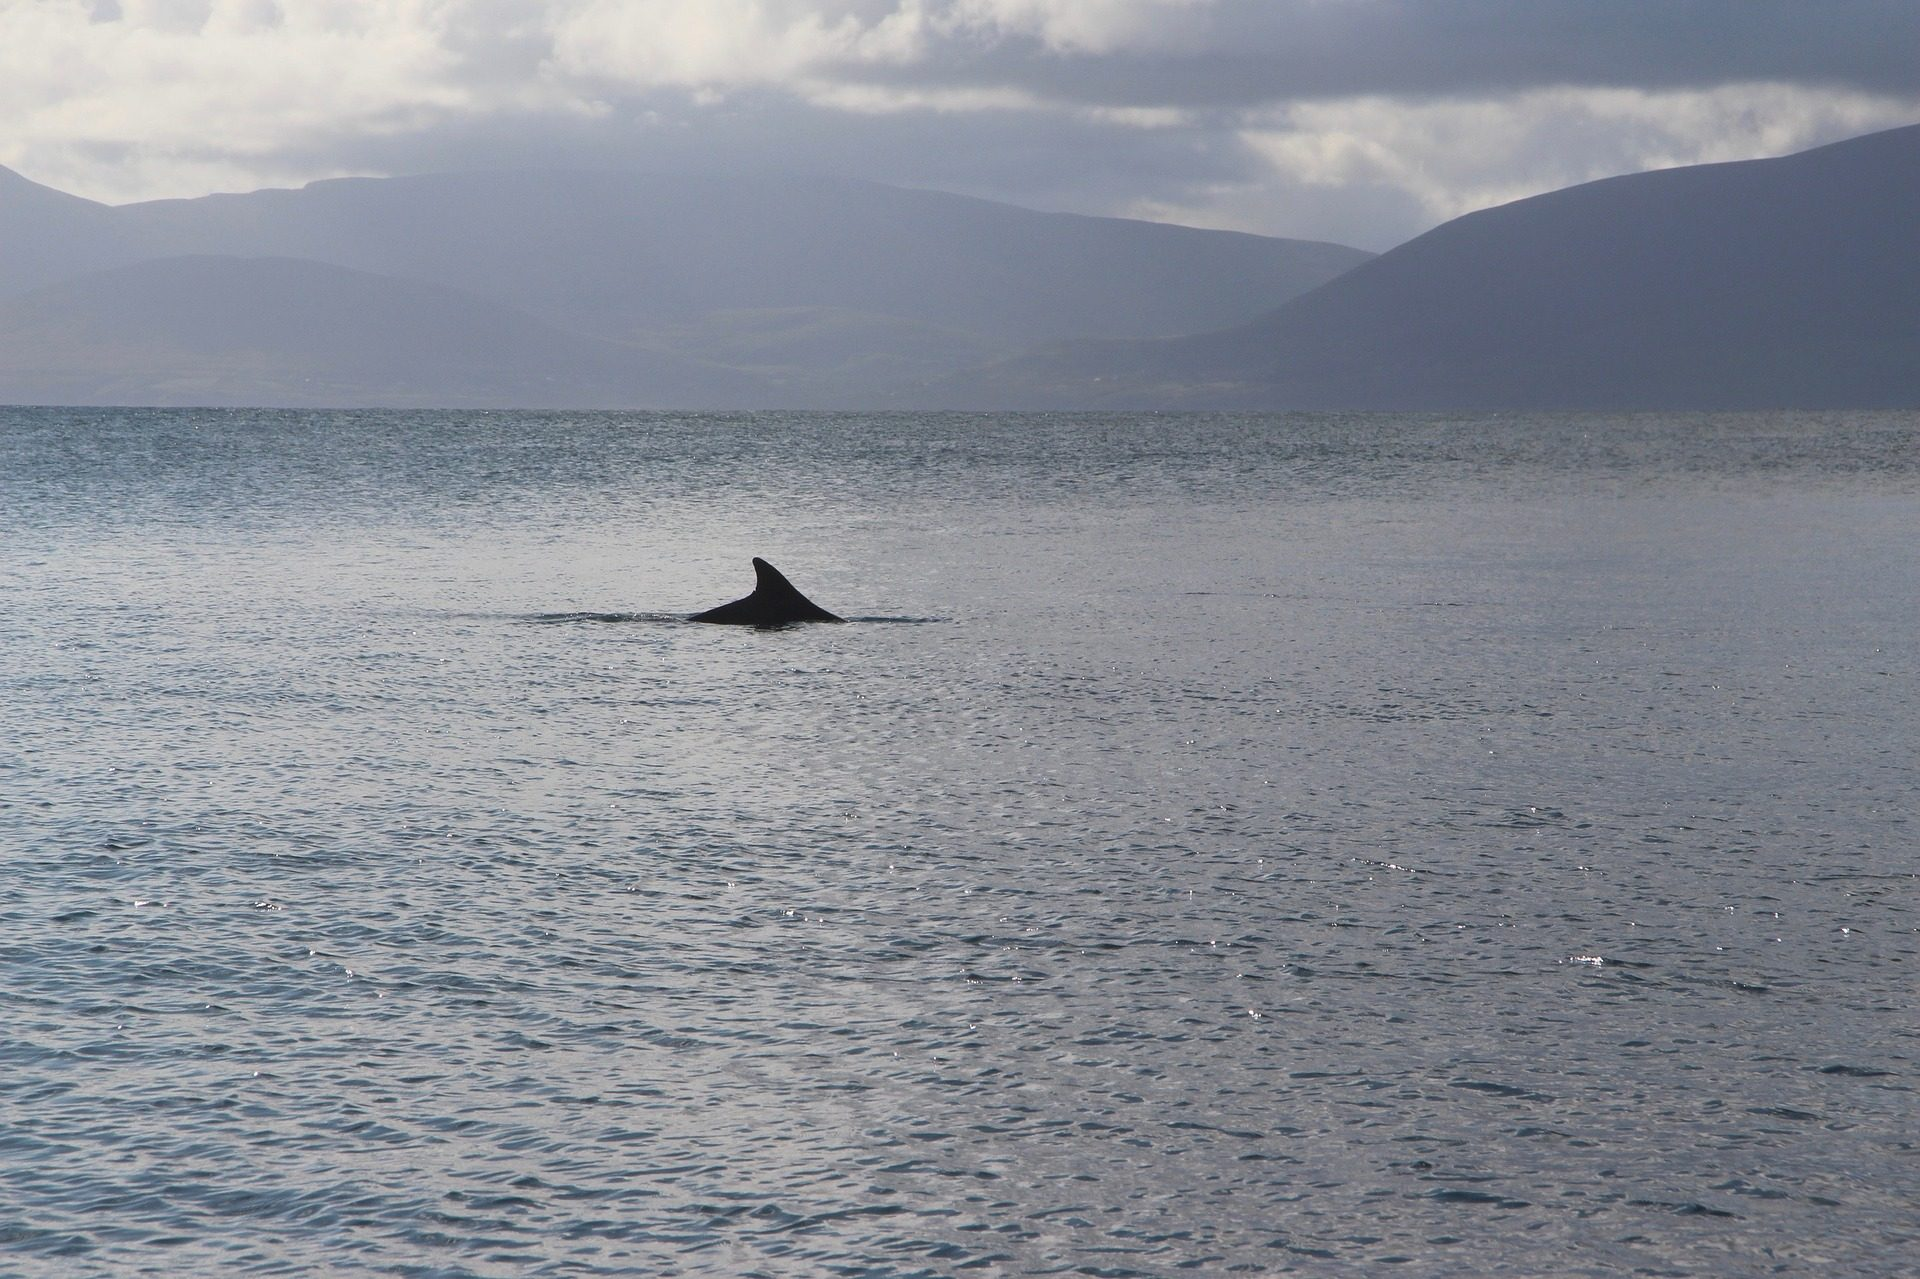 Mer, Montañas, eau, fin, Dauphin, Irlande - Fonds d'écran HD - Professor-falken.com